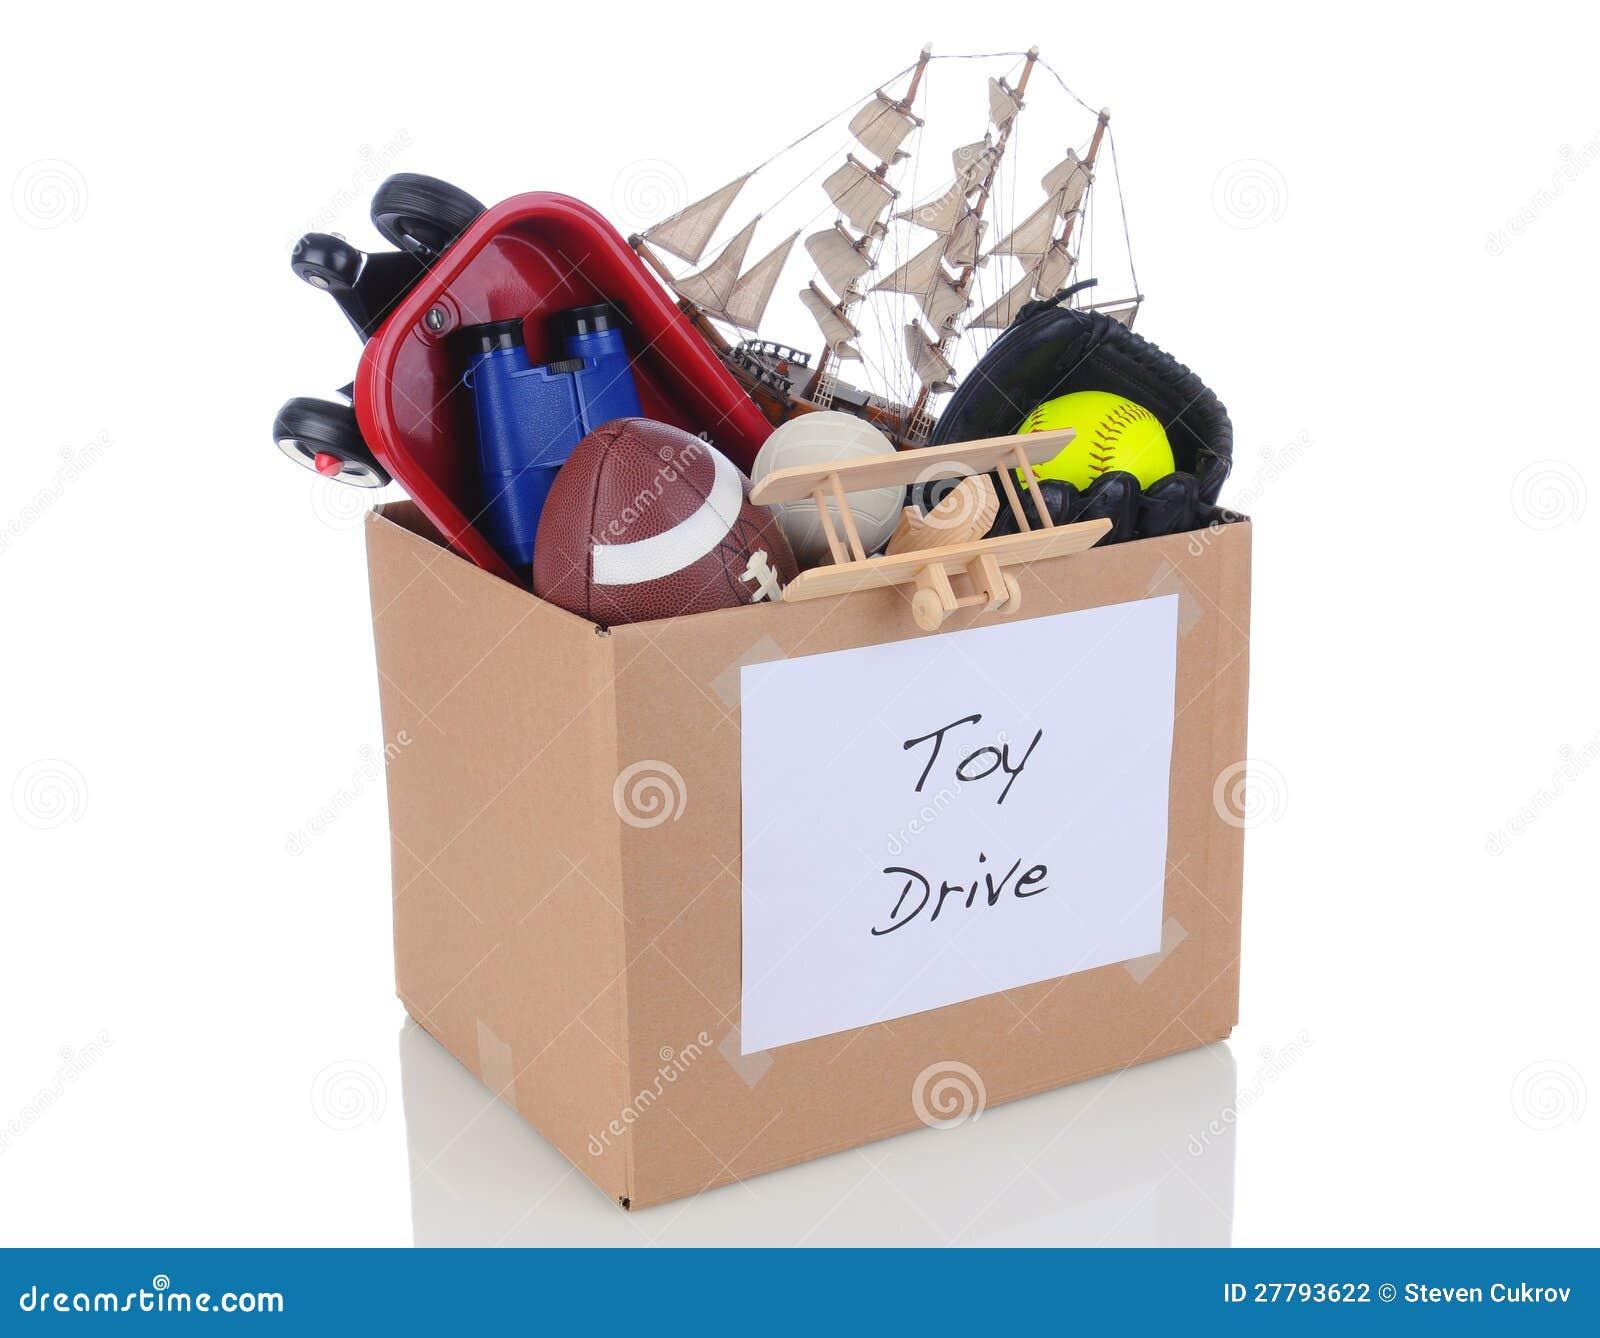 Christmas Toy Box : Toy drive donation box stock photo image of binoculars